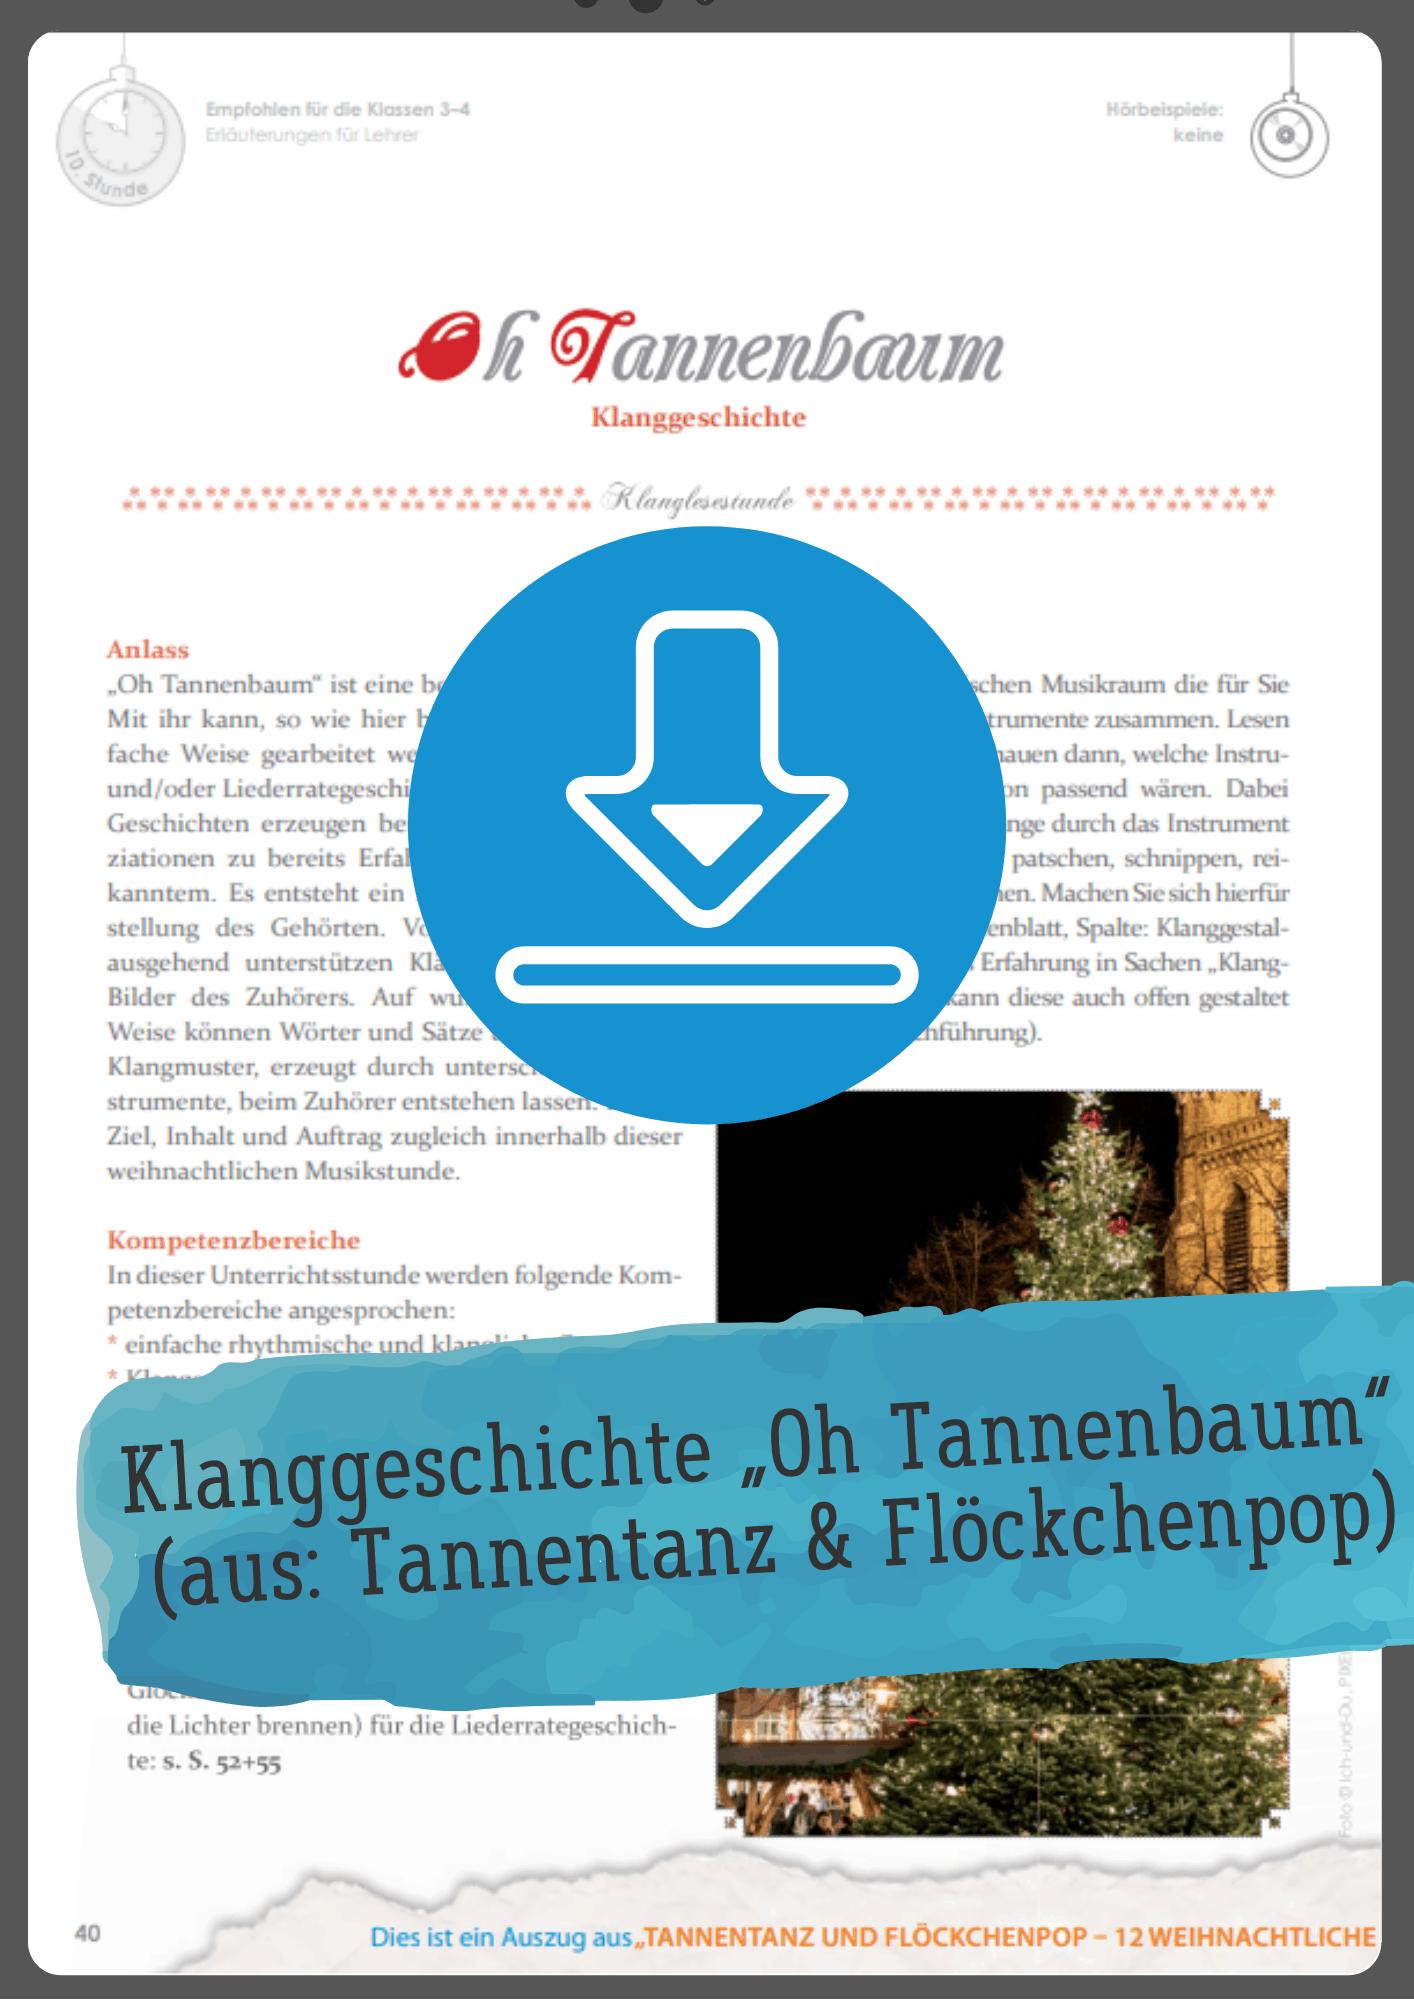 Klanggeschichte_Tannenbaum_Gratis